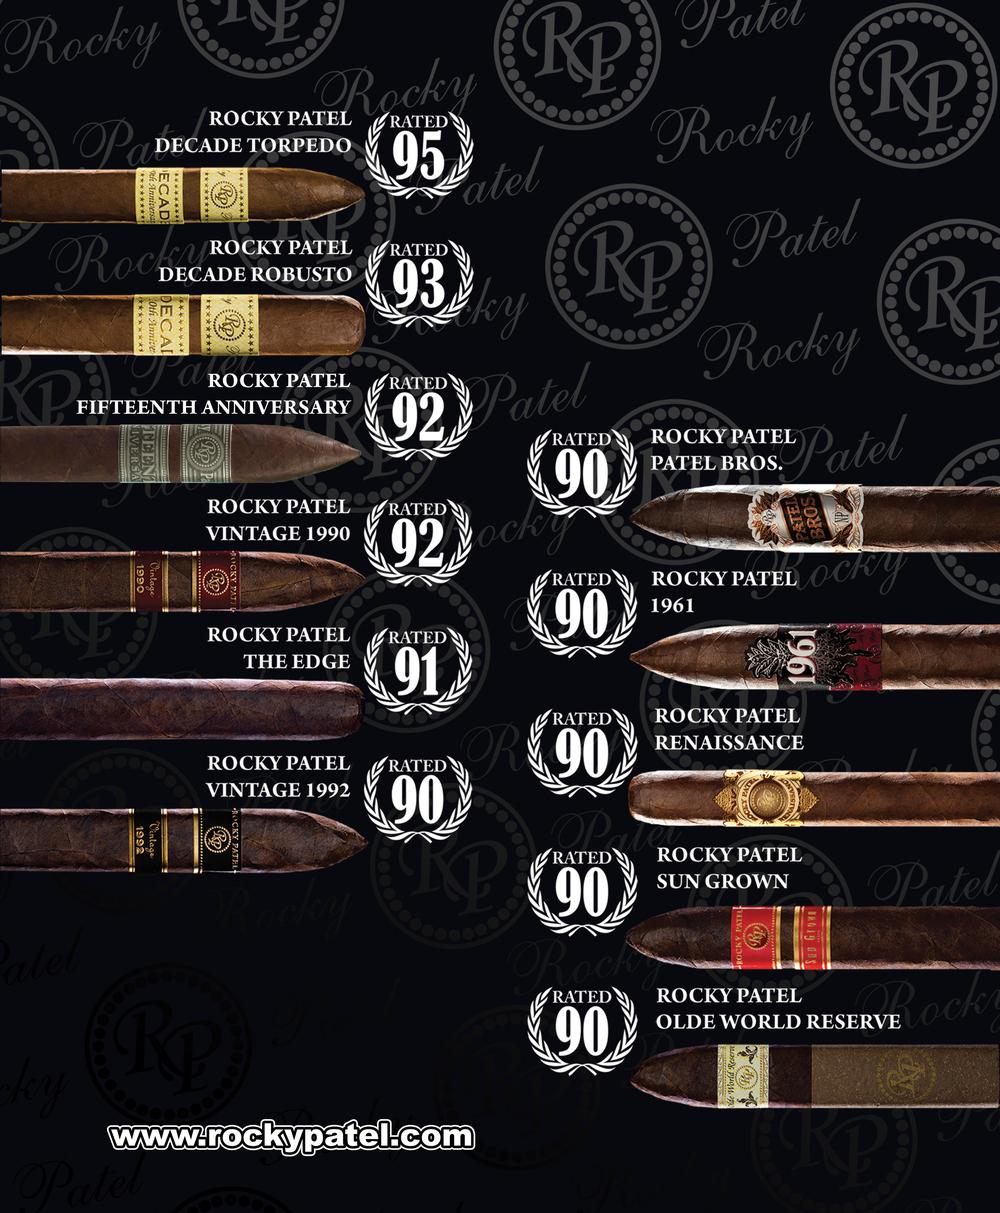 jwk_patel_cigars.jpg